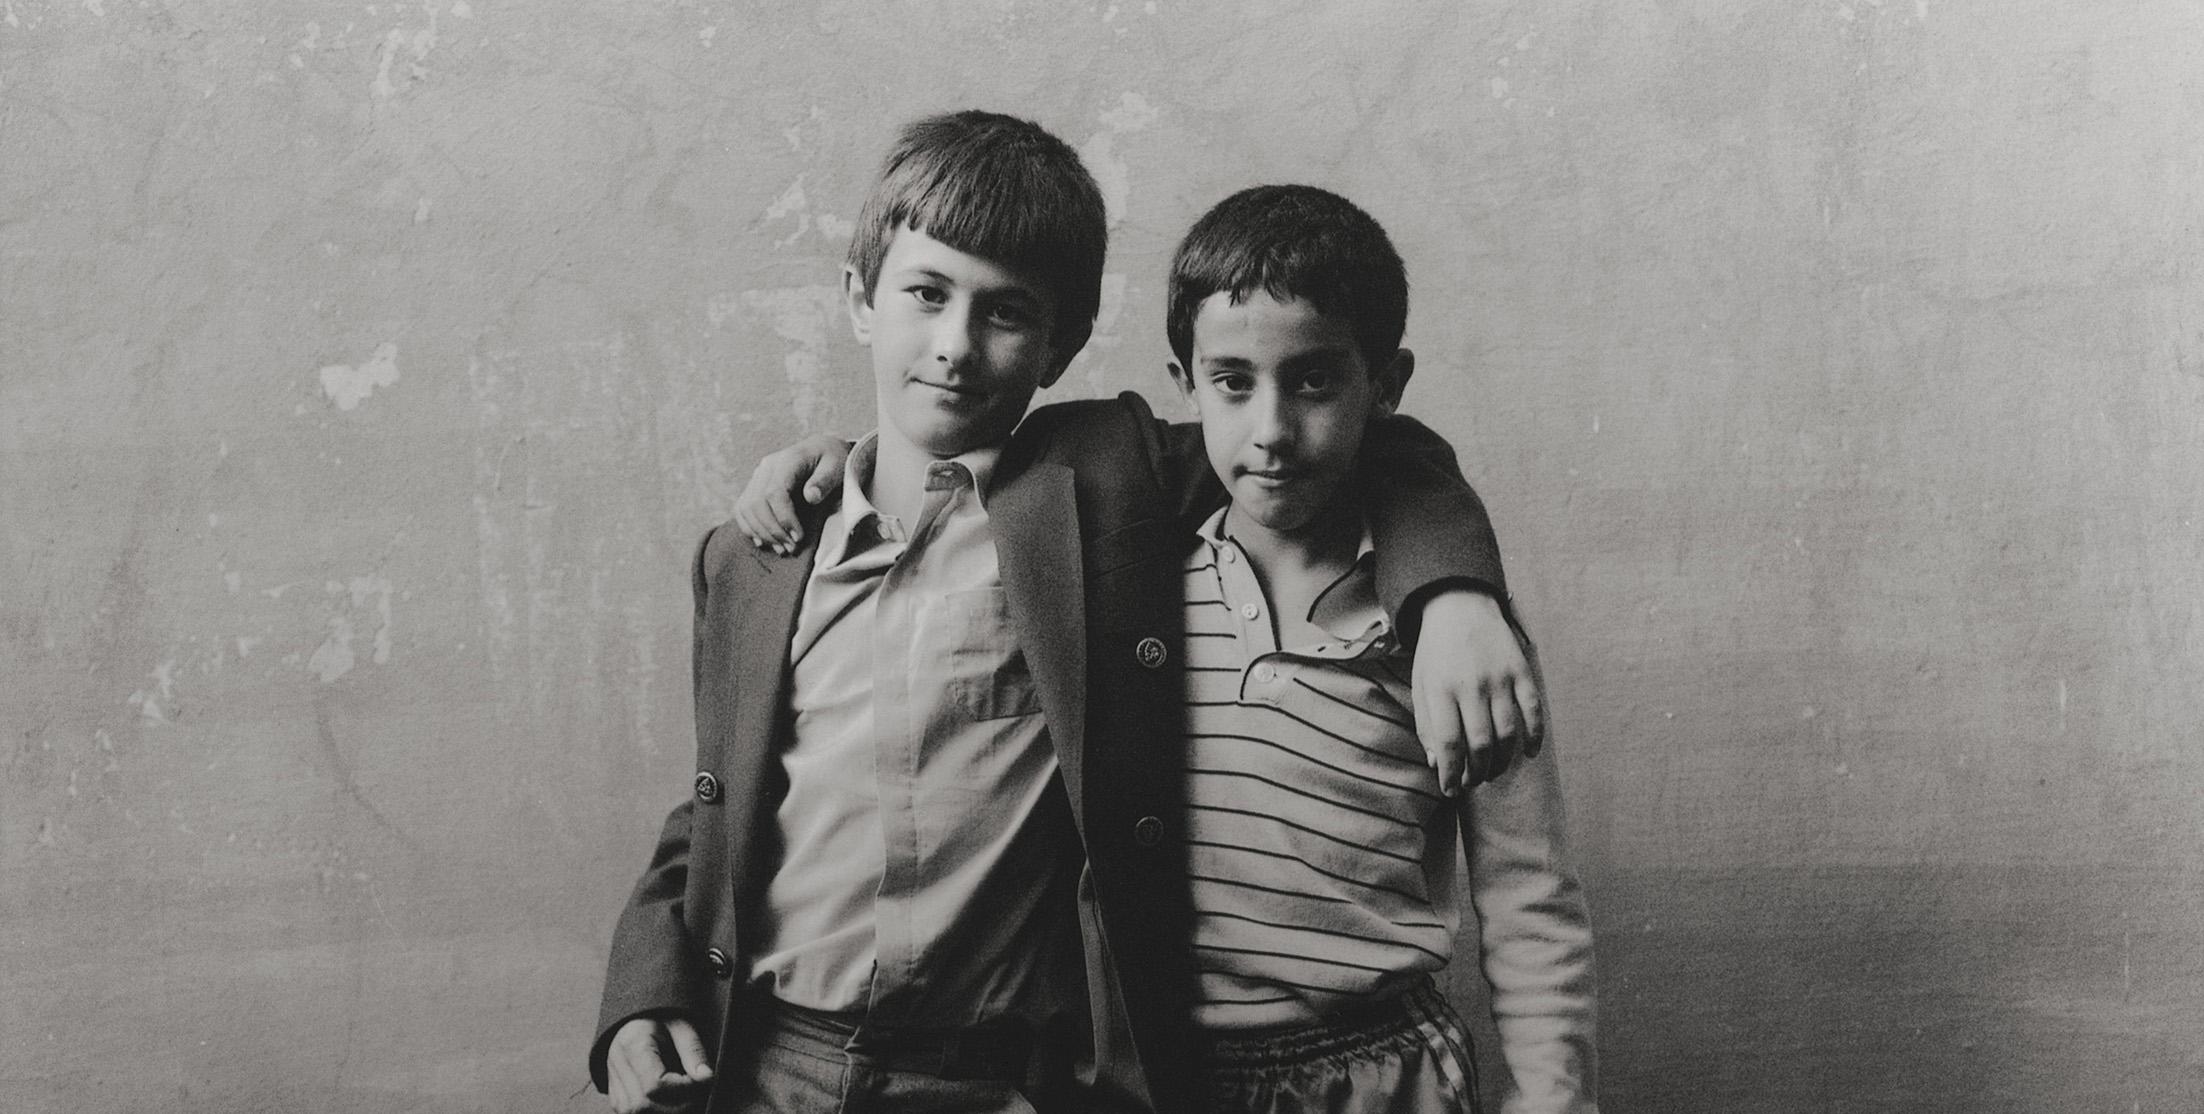 Turkey_1983_3